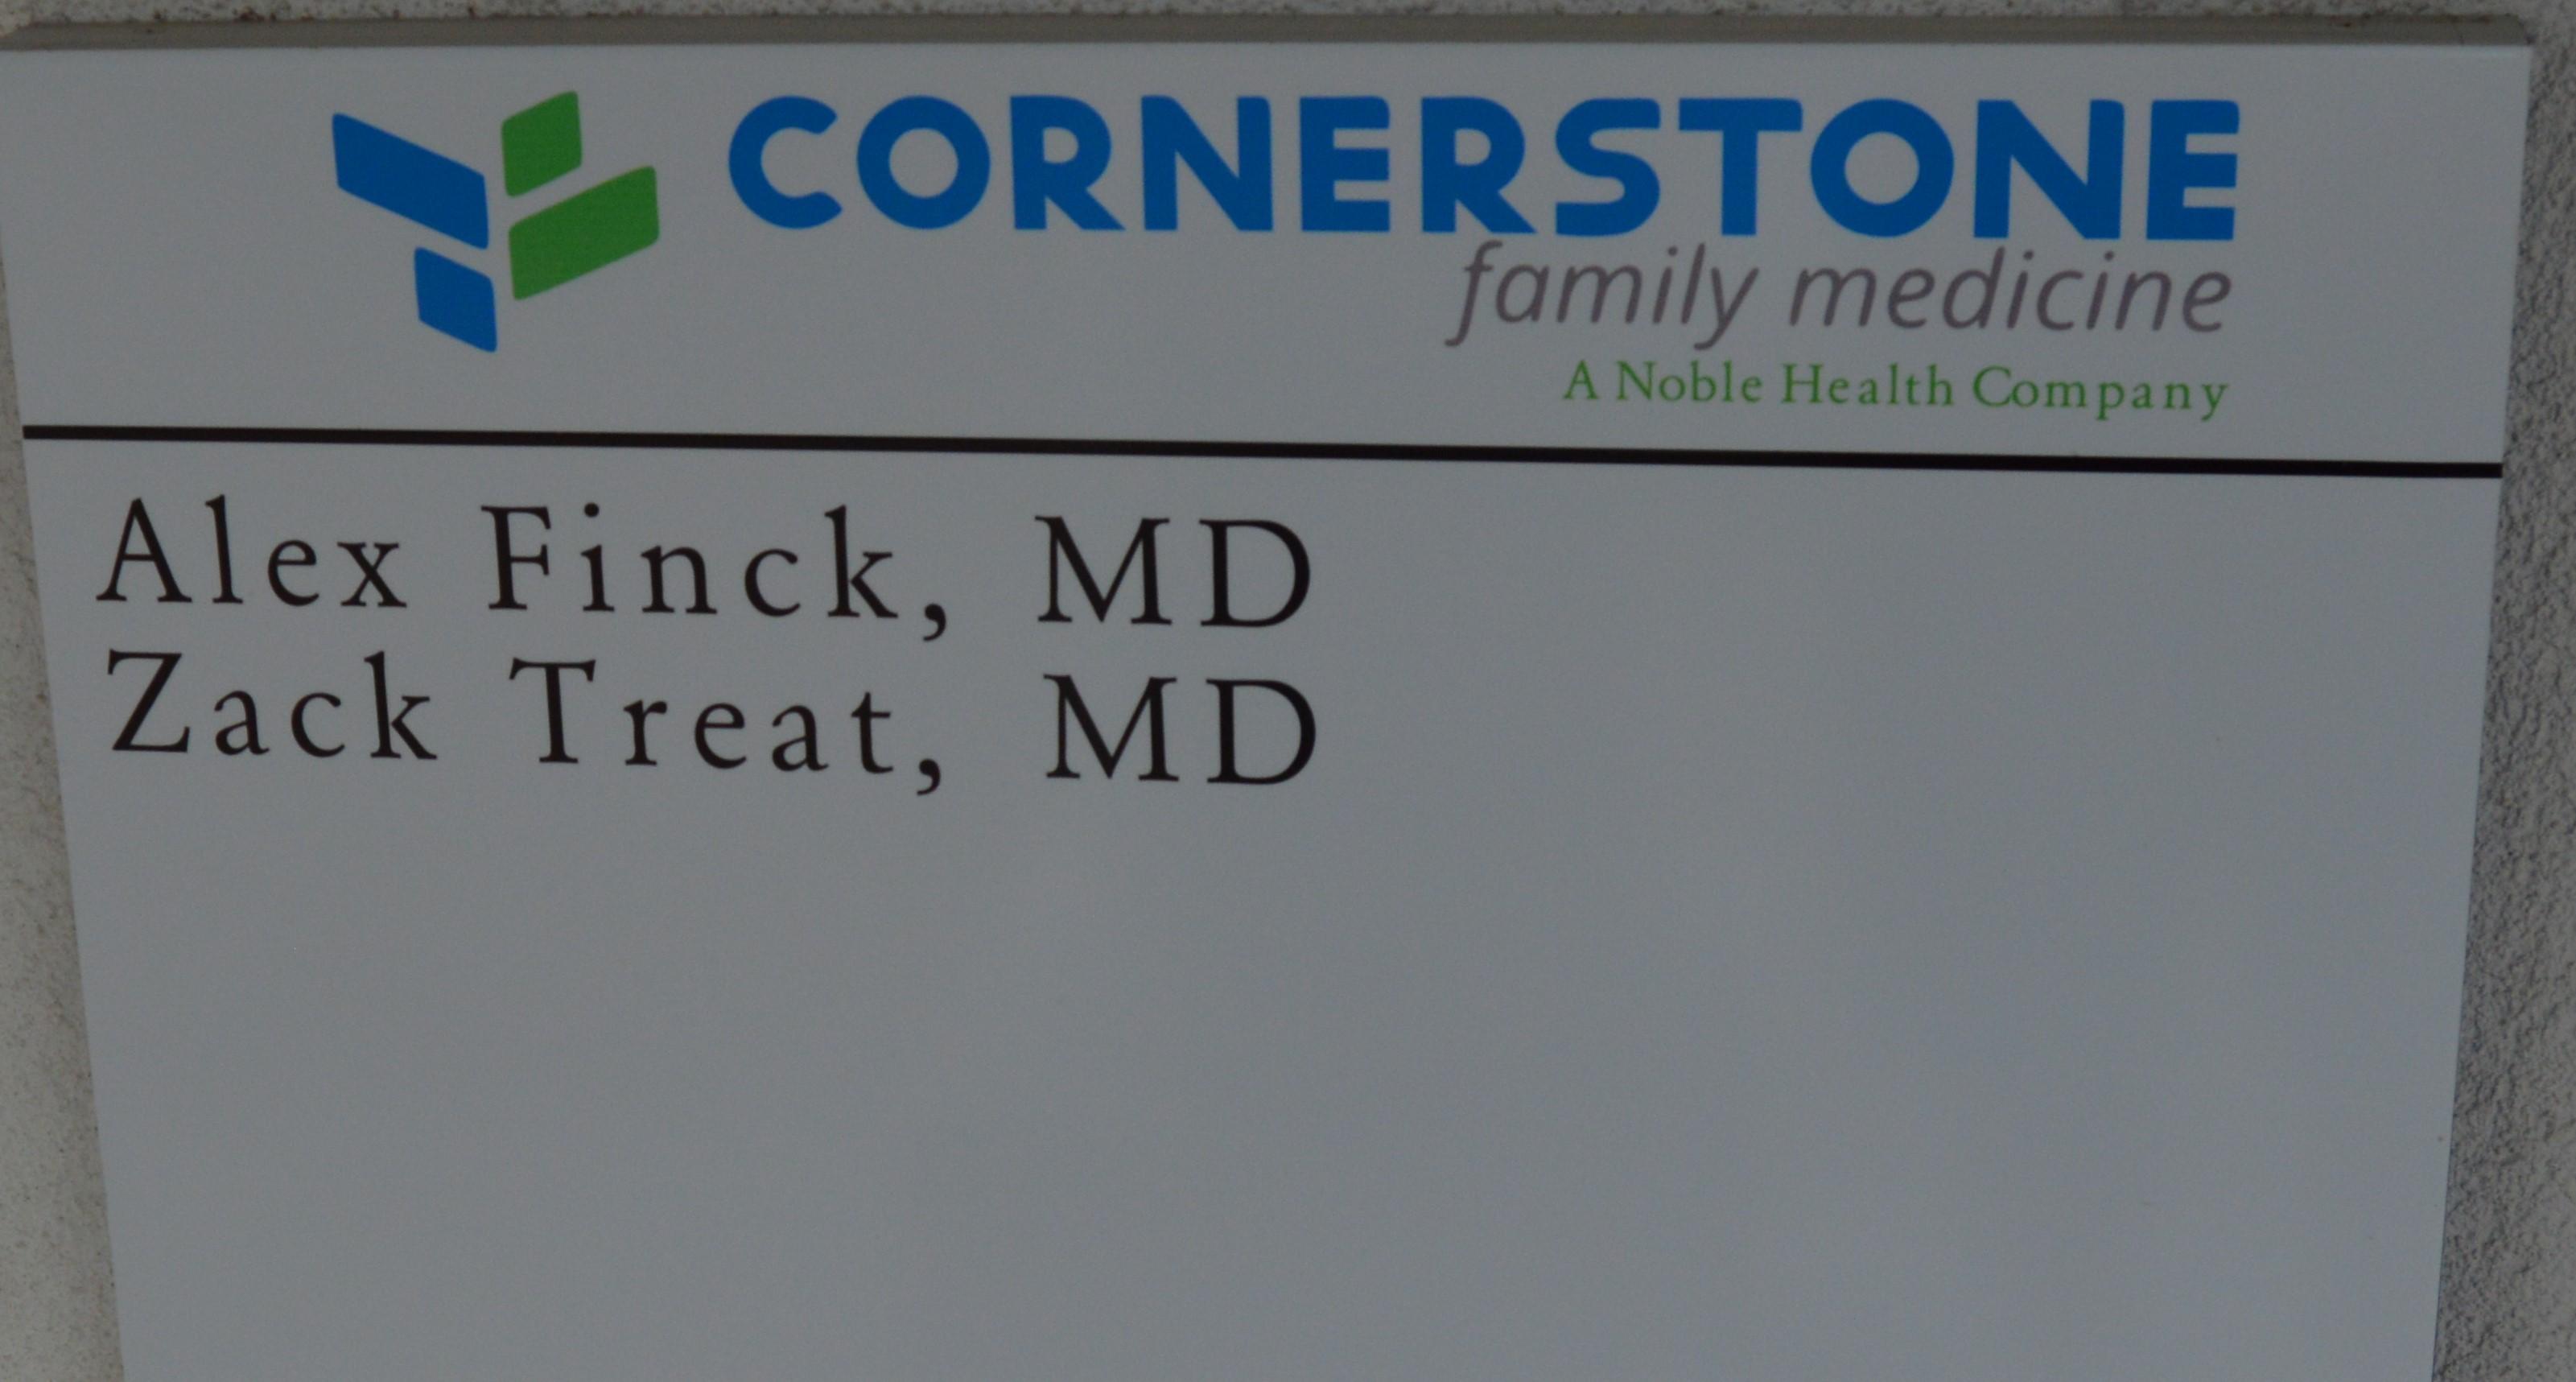 Ribbon Cutting At Noble Health's Cornerstone Family Medicine Clinic